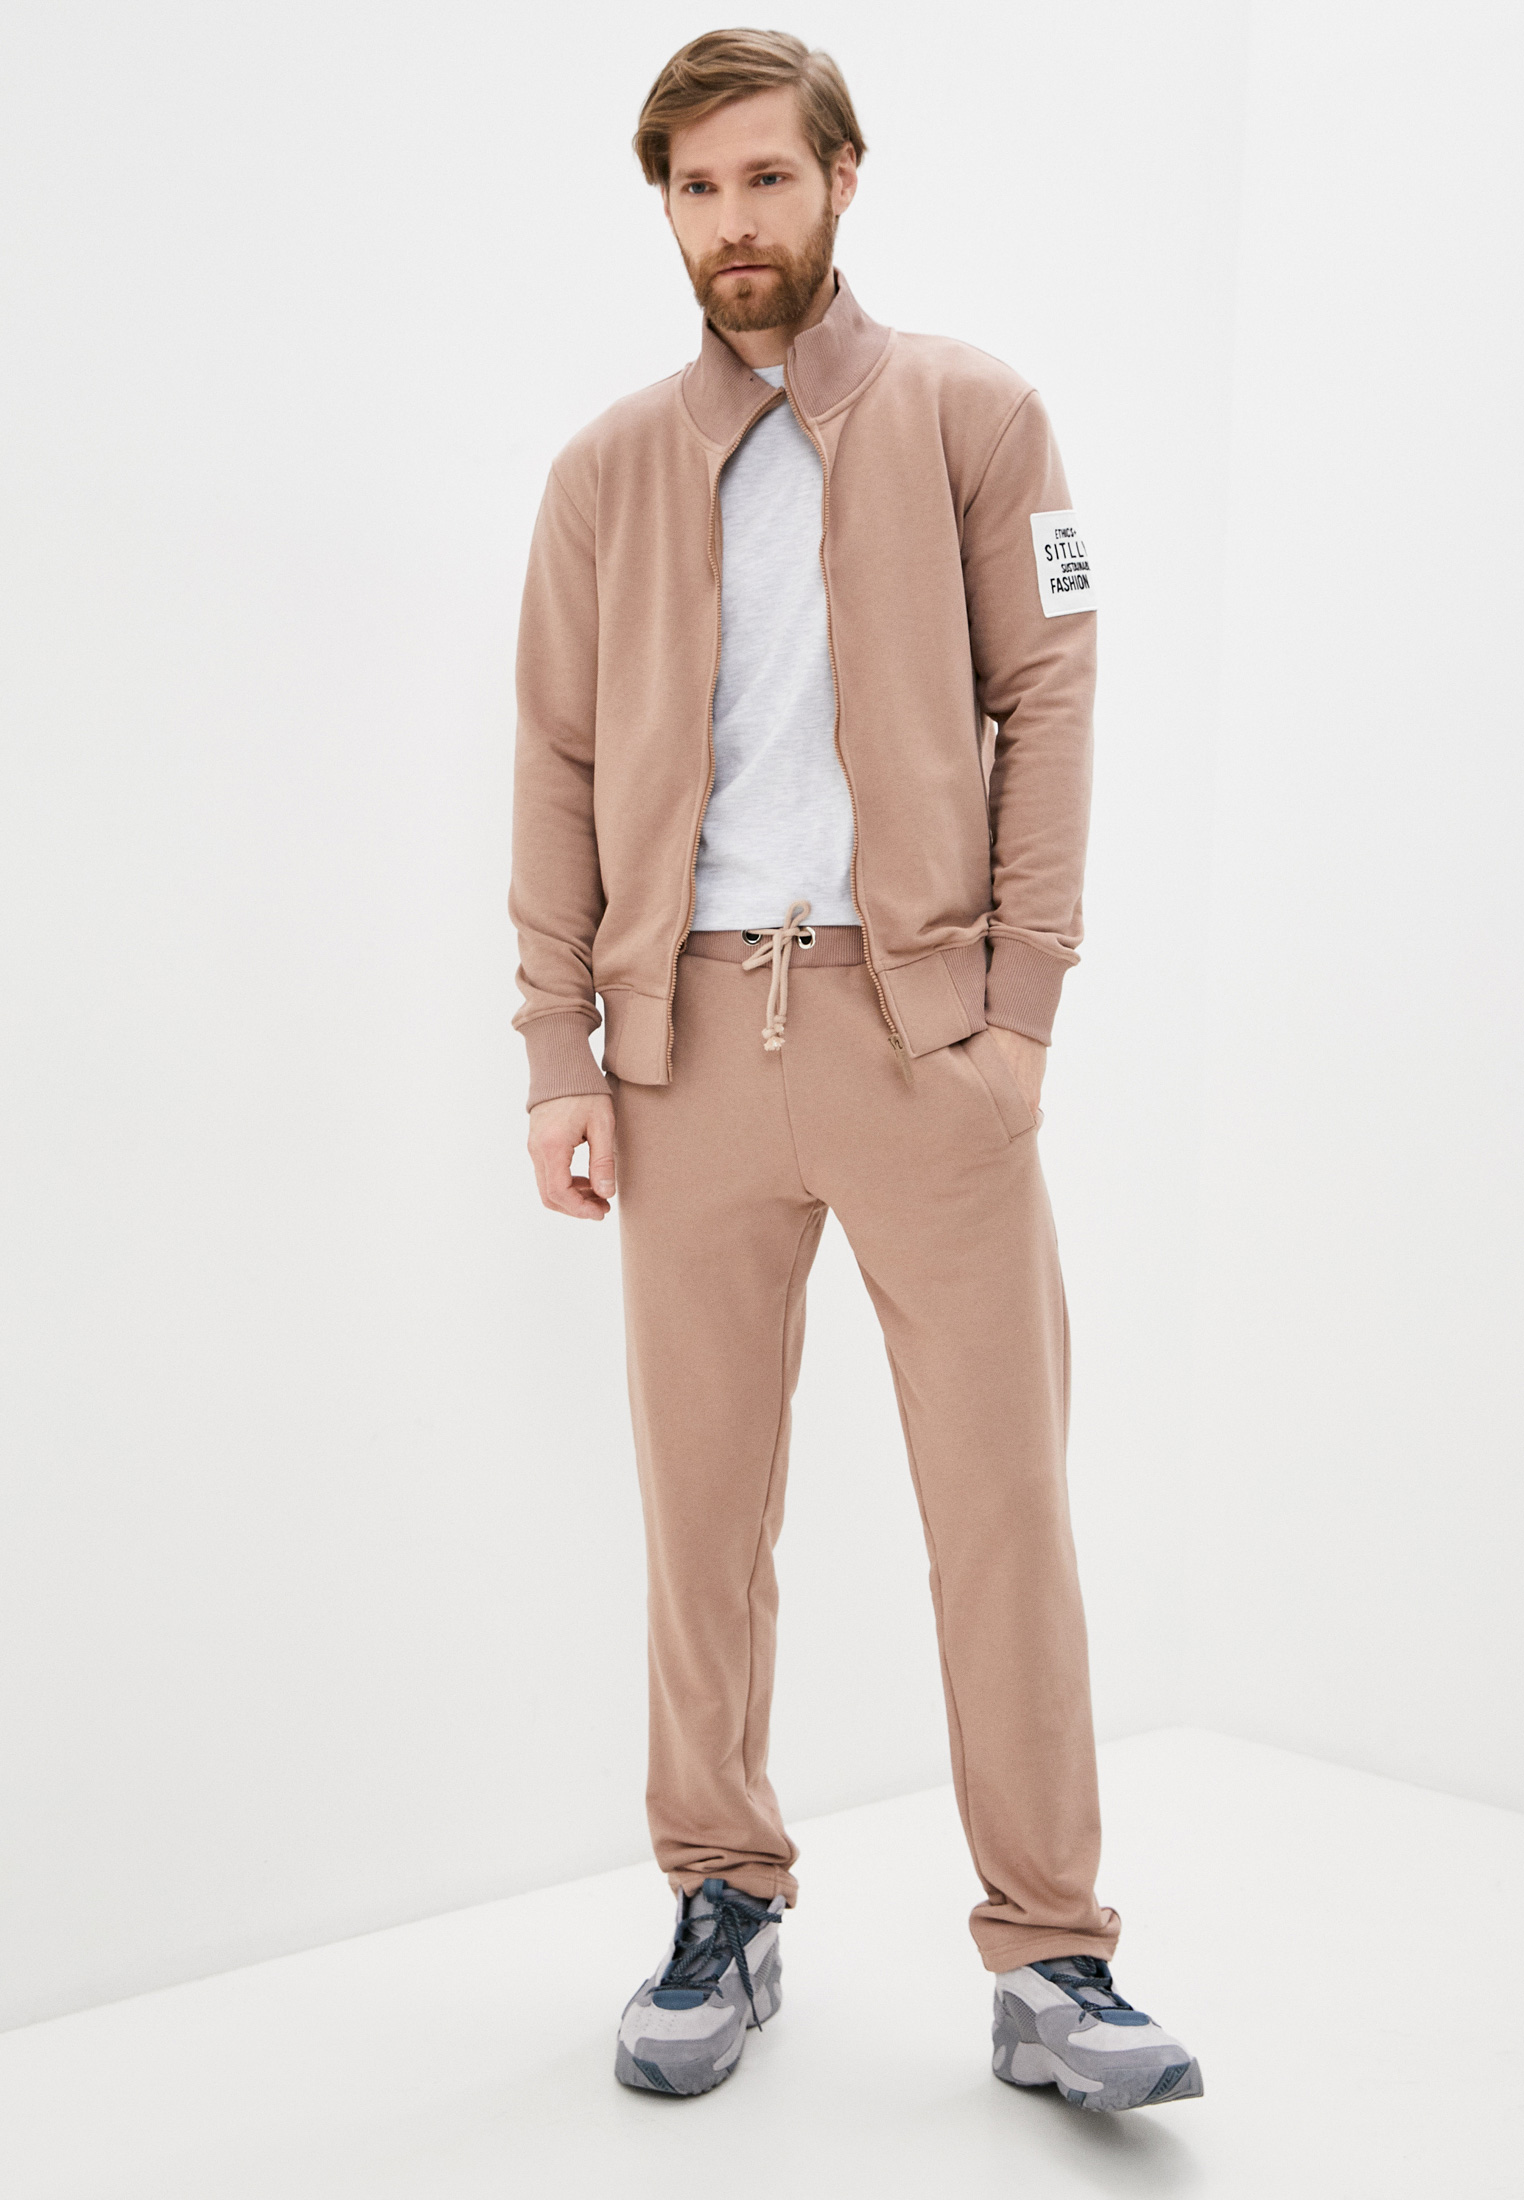 Спортивный костюм Sitlly 20823